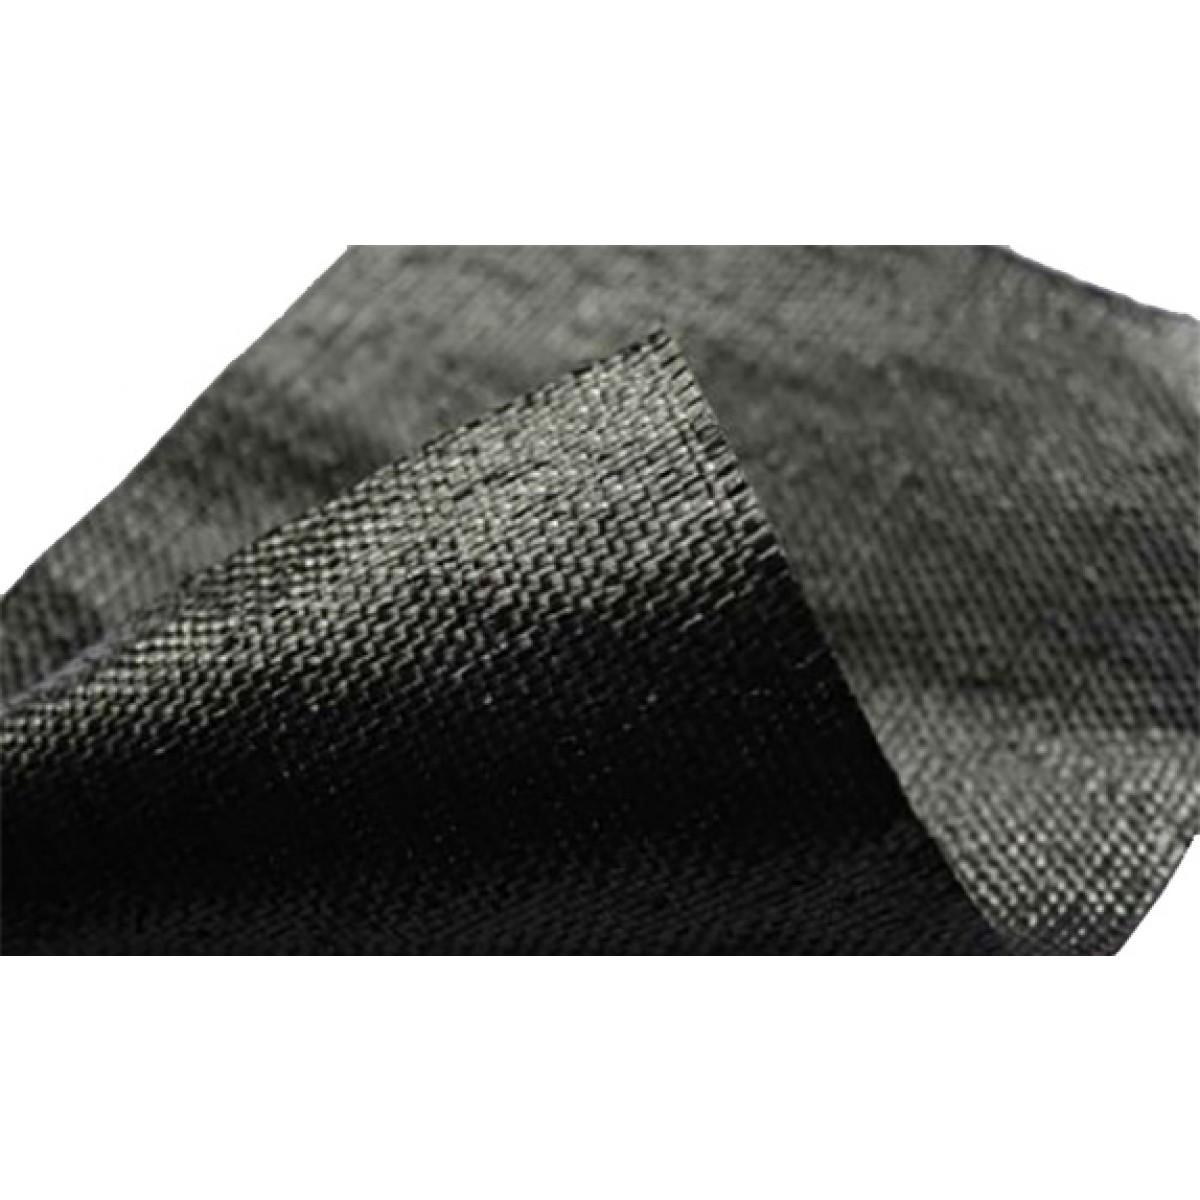 Black Woven Geotextile (Trax01) 4.5mtr x 100mtr